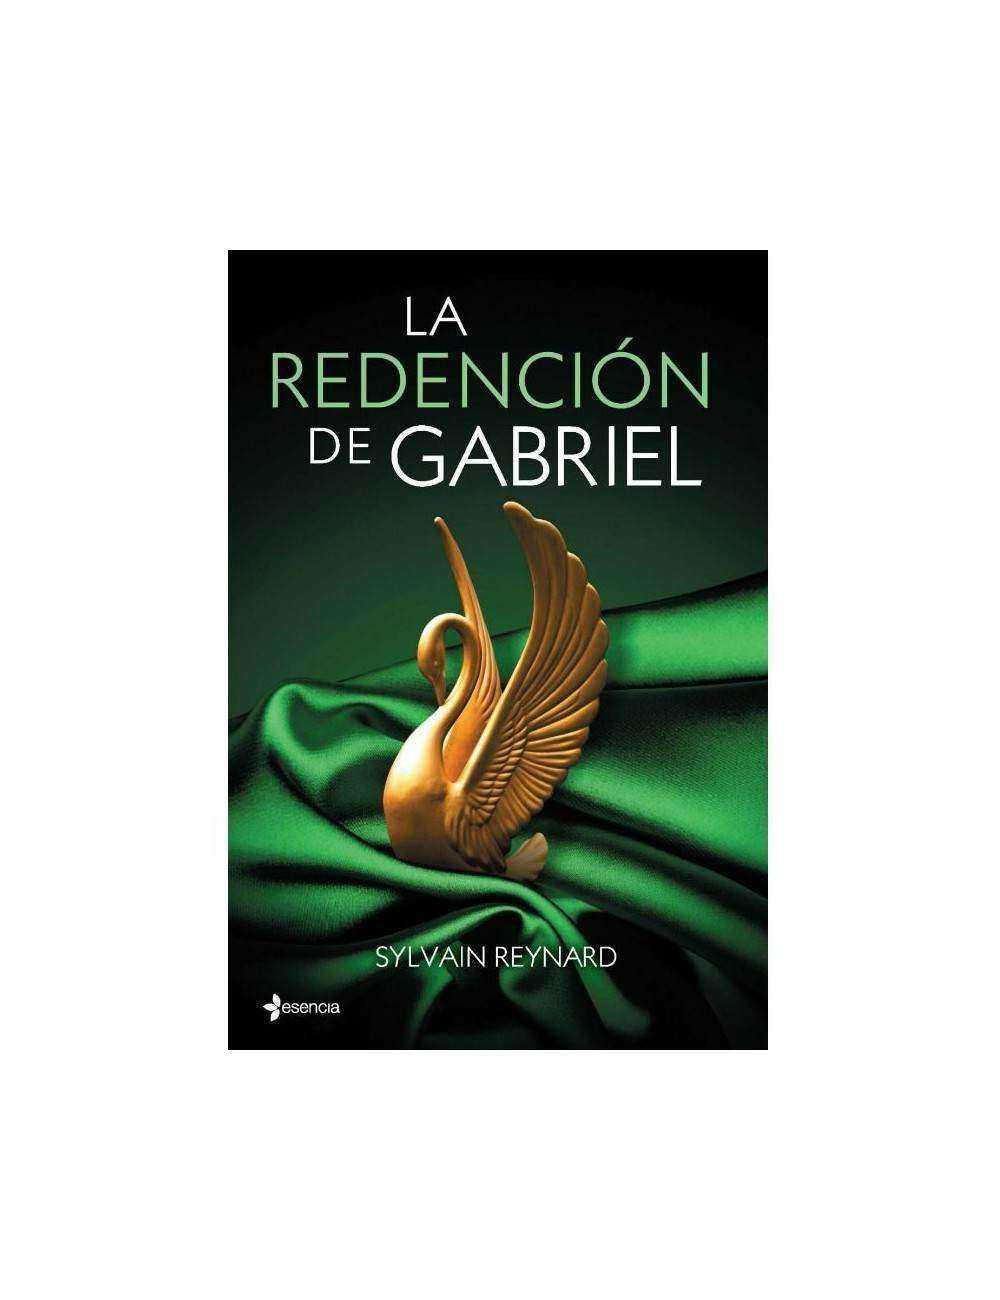 GRUPO PLANETA LA REDENCION DE GABRIEL EDICION BOLSILLO